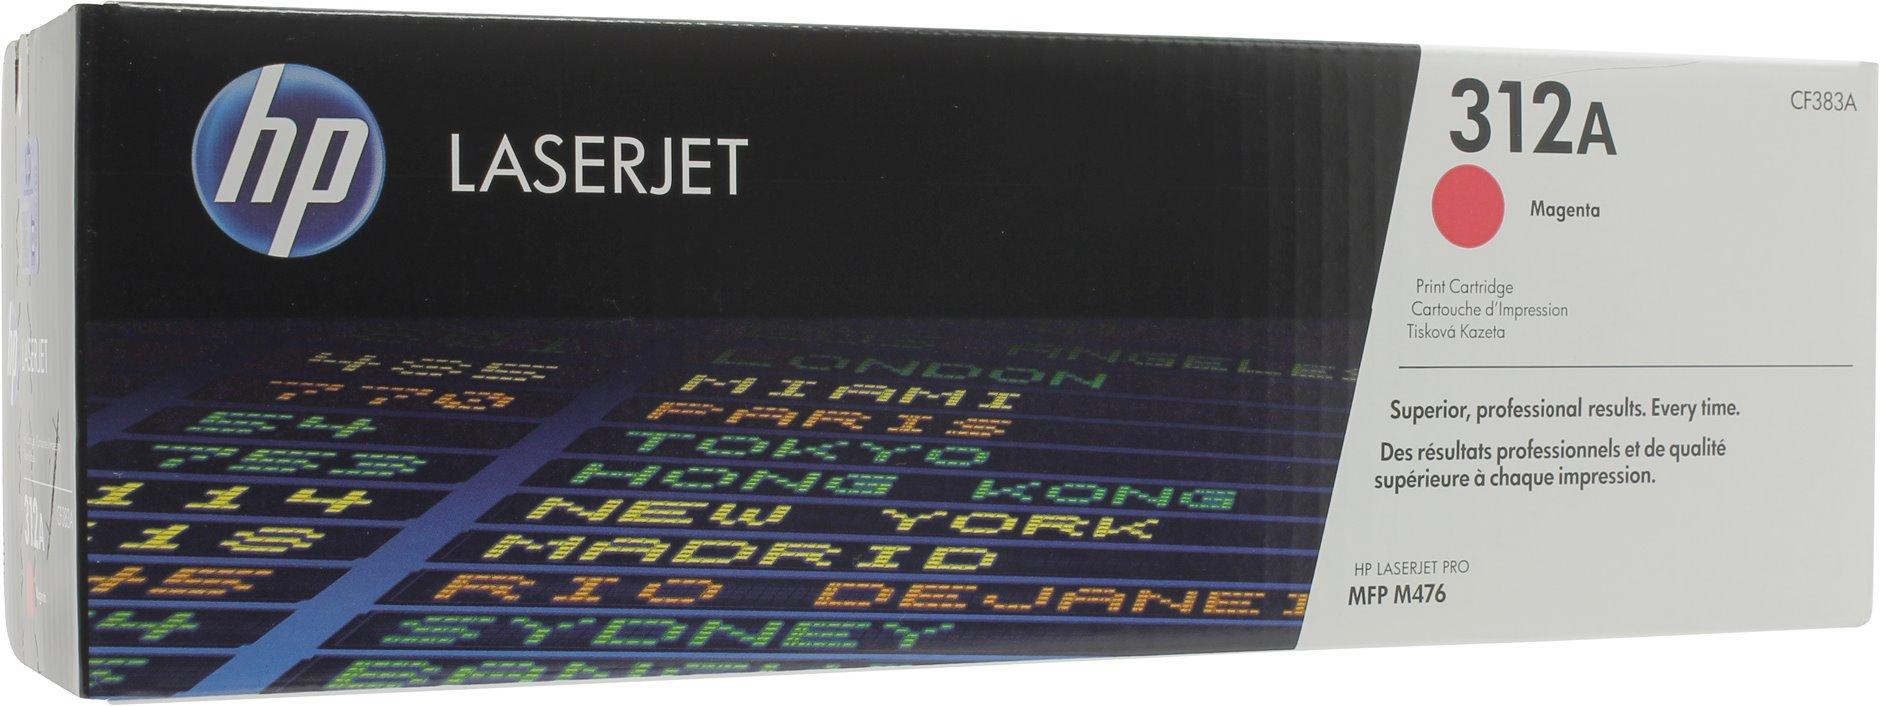 312A картридж hp cf382a 312a для color laserjet m475 m476 желтый